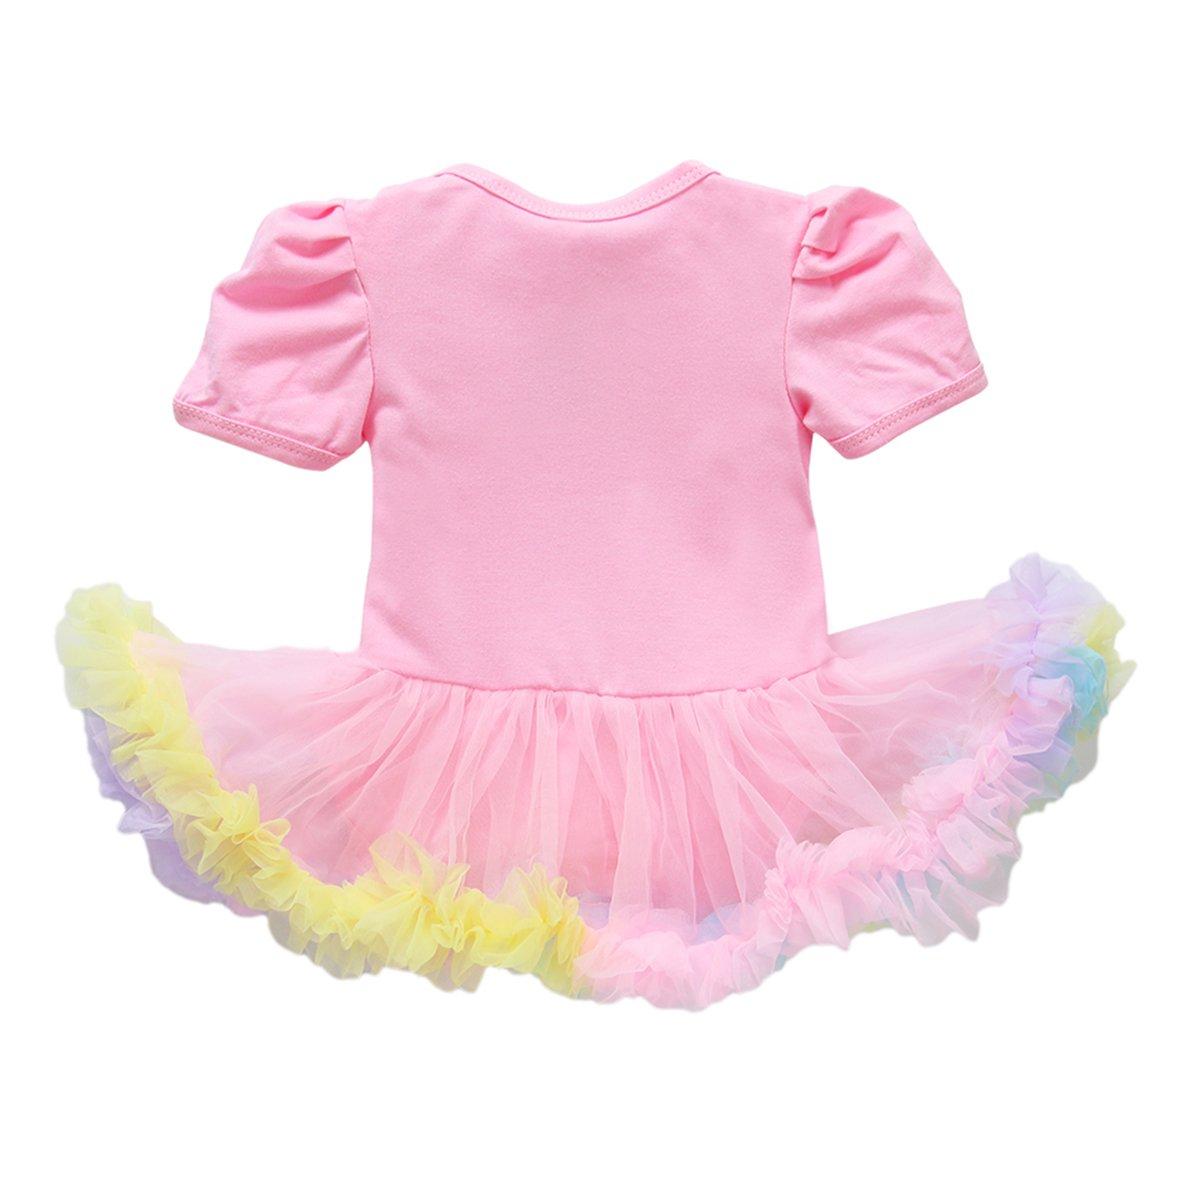 Baby Mädchen Erstes Ostern Hase Strampler Kleid Stirnband Schuhe Party Outfits